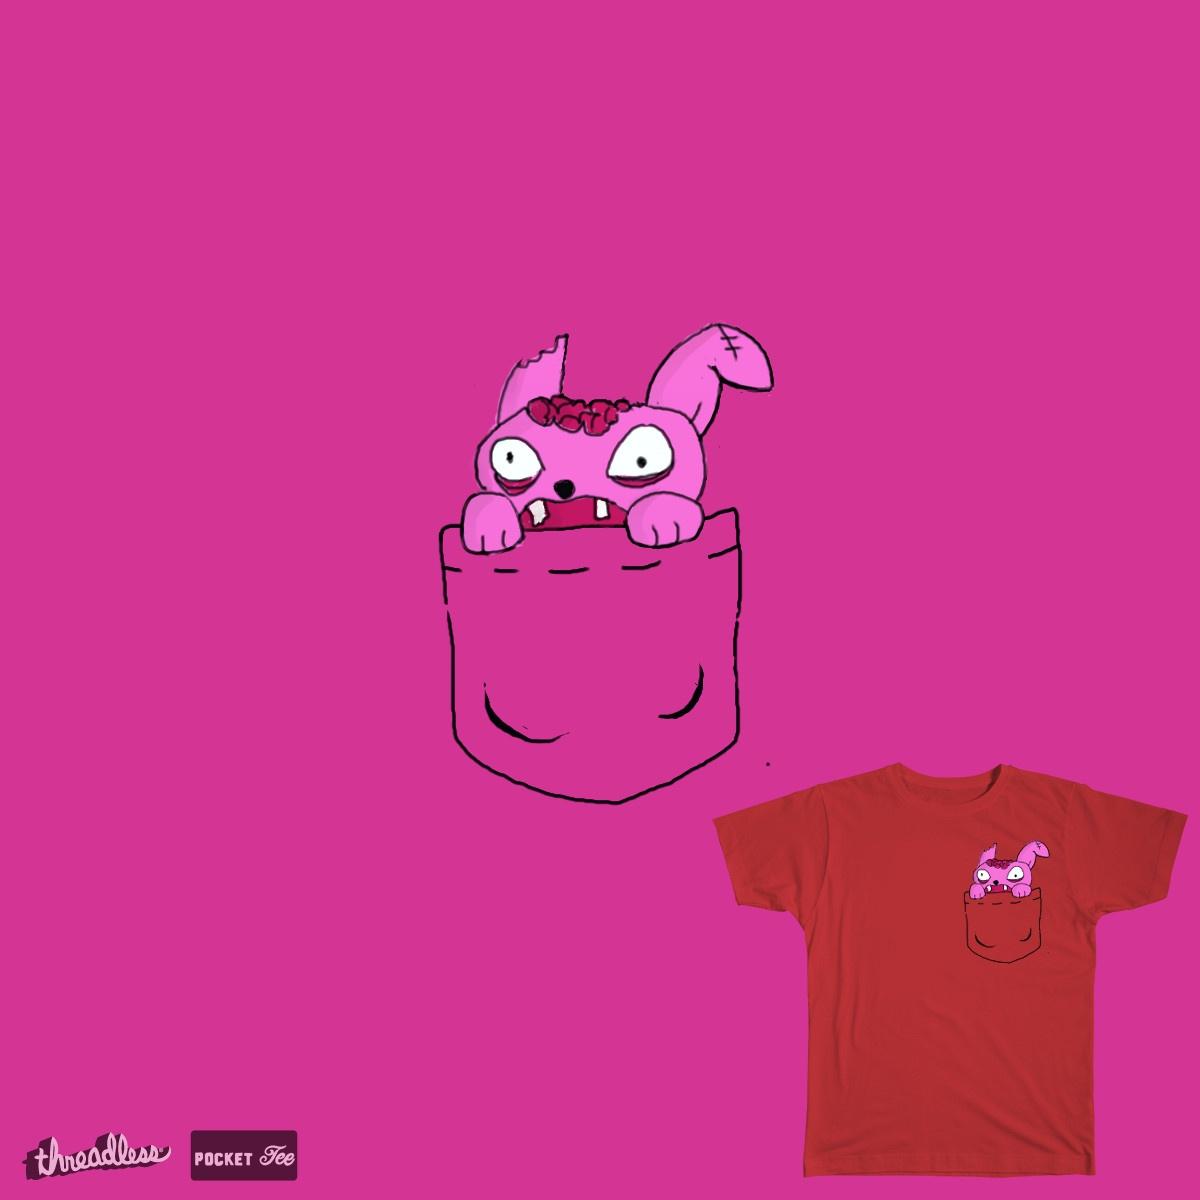 Pocket Zombie Rabbit by OneWeirdDude on Threadless